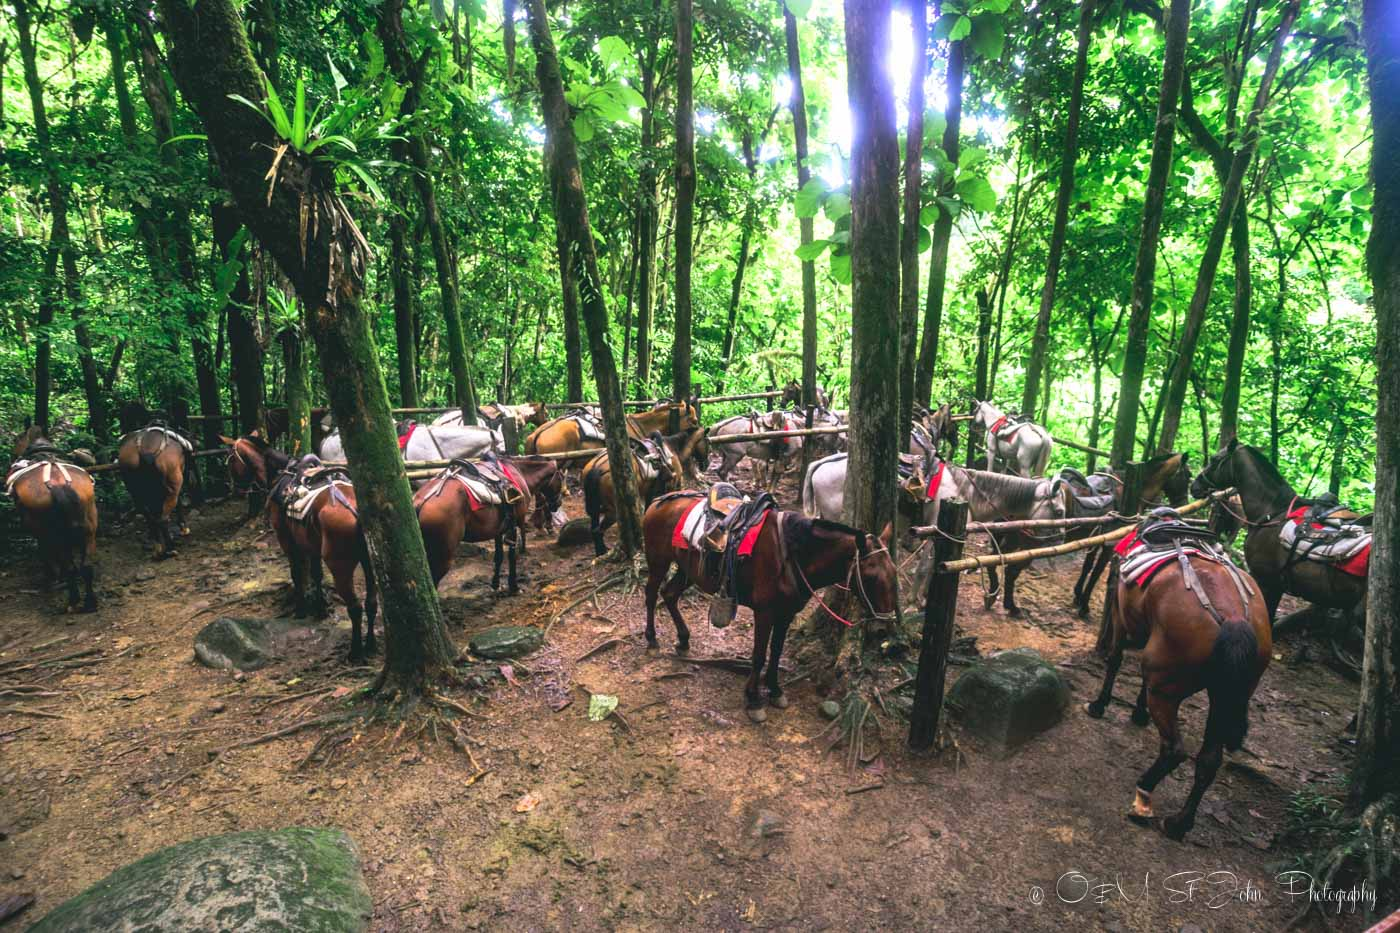 Horseback riding tour at Nauyaca Waterfalls, Costa Rica